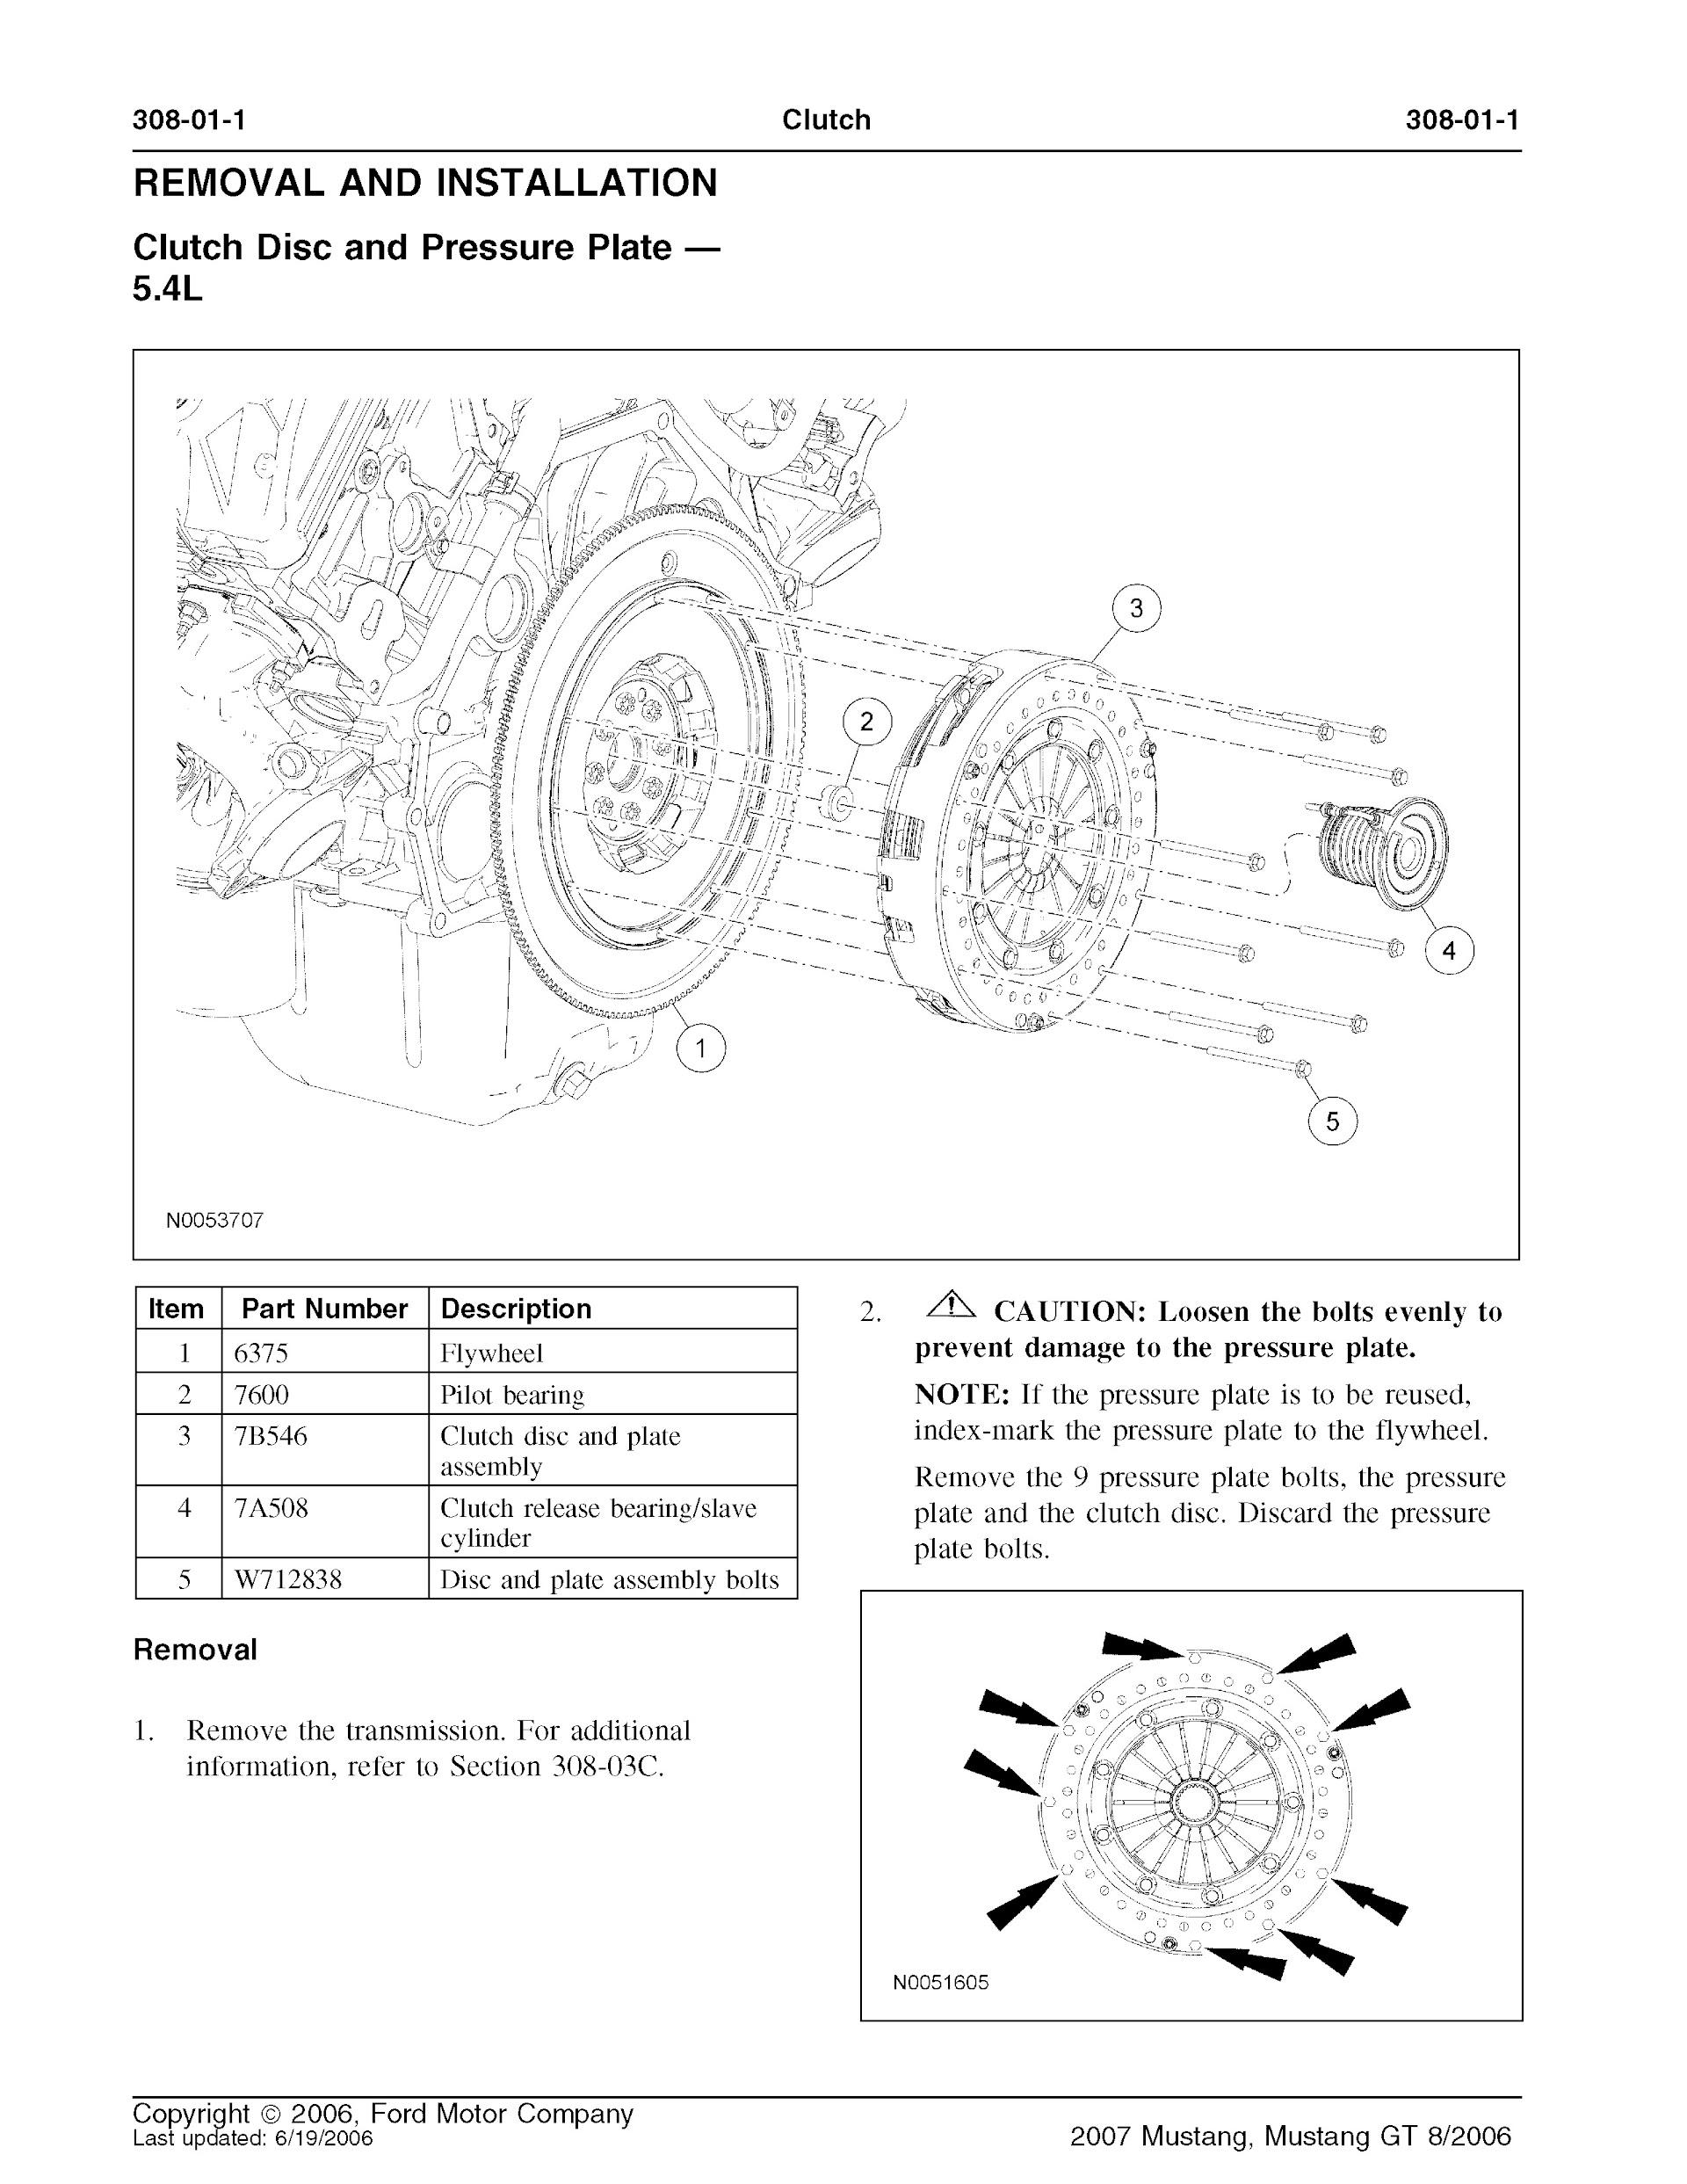 Download 2007 Ford Mustang and Mustang GT Service Repair Manual